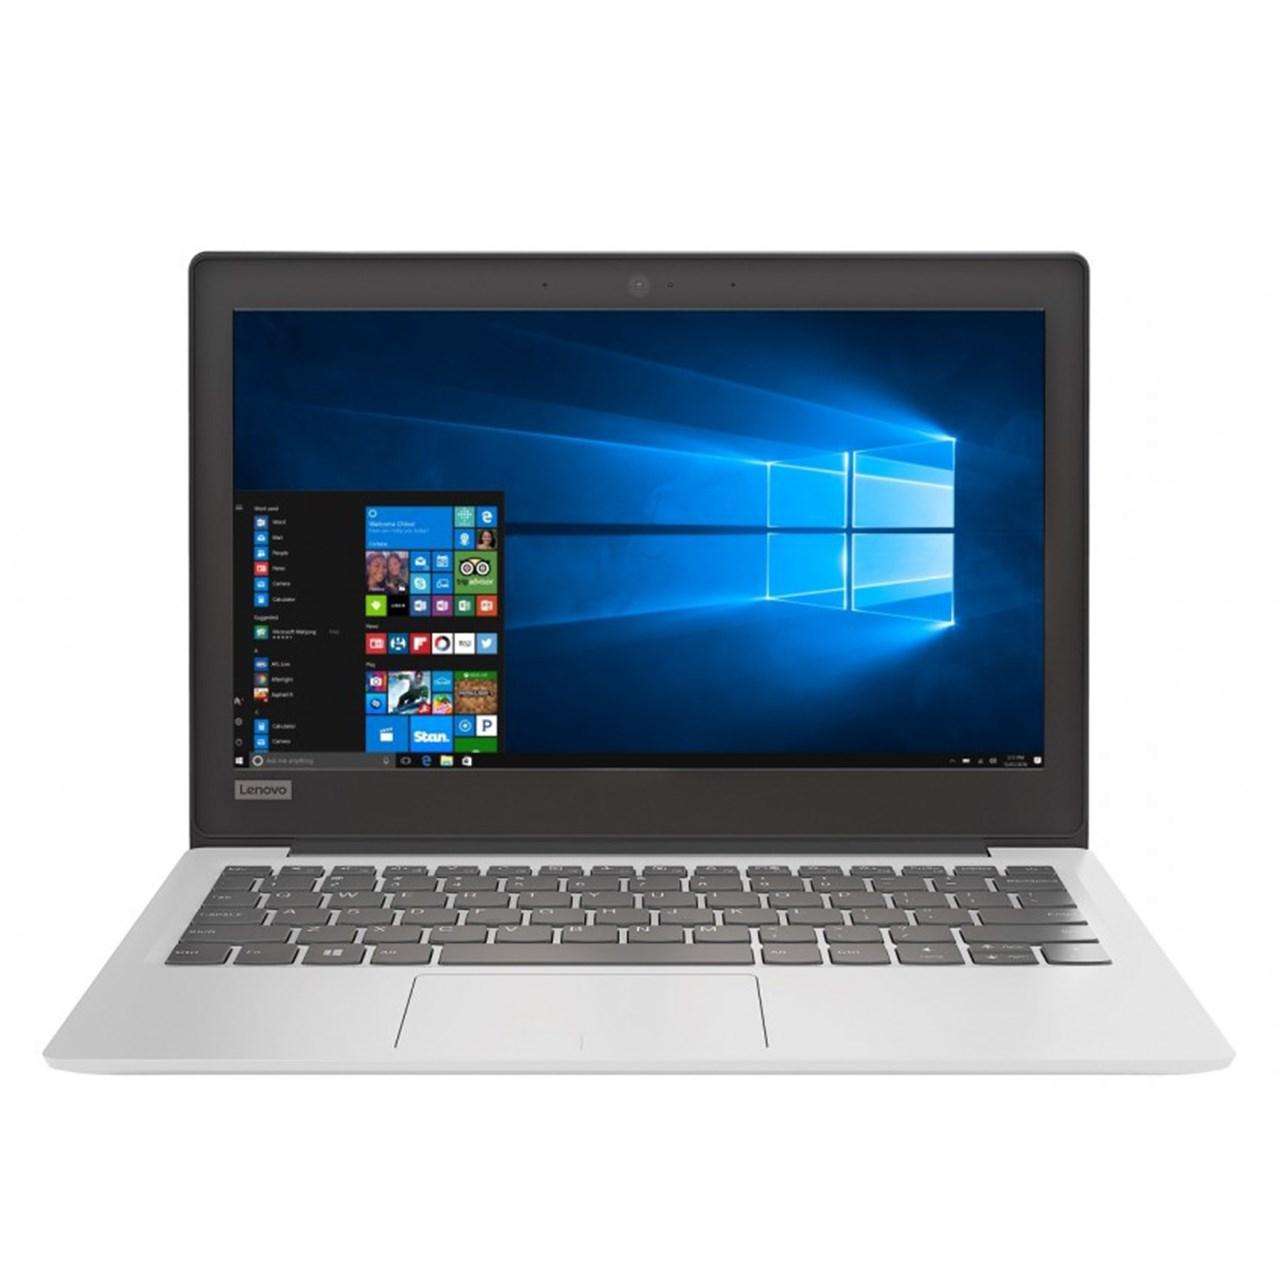 لپ تاپ 11 اینچی لنوو مدل  Ideapad 120s - A